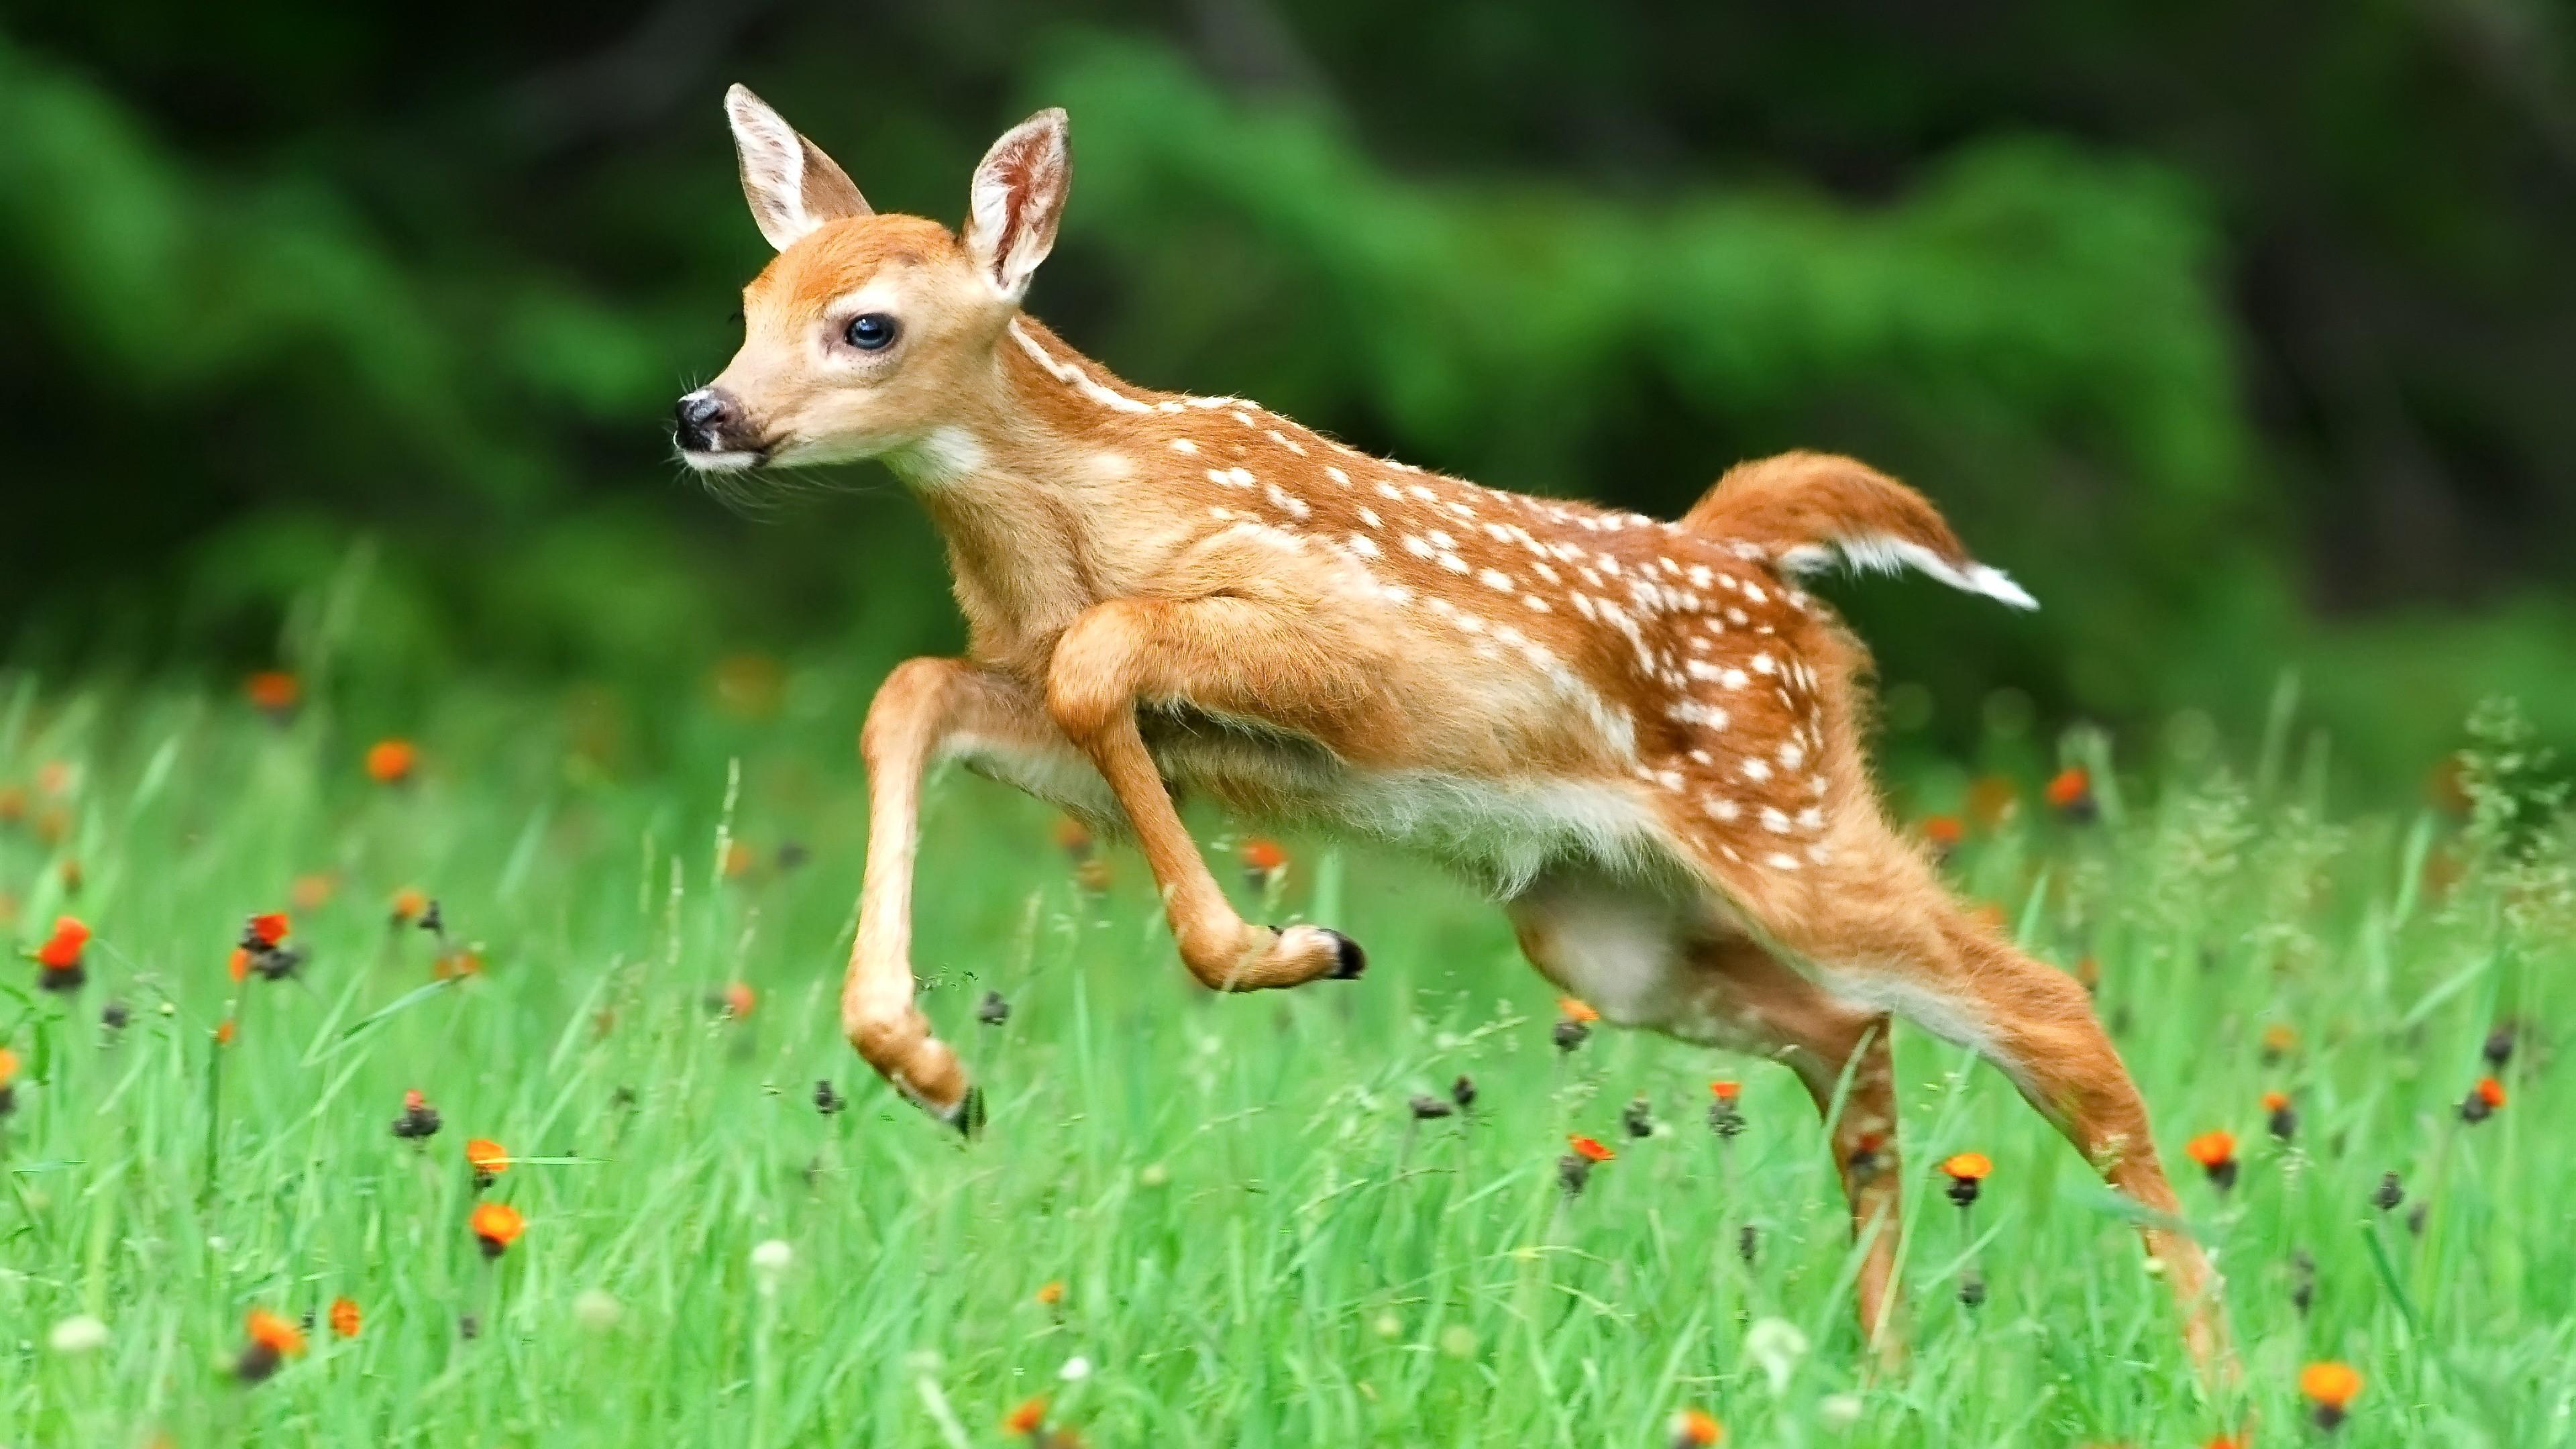 Res: 3840x2160, Cute Baby Deer Running 4K Wallpaper